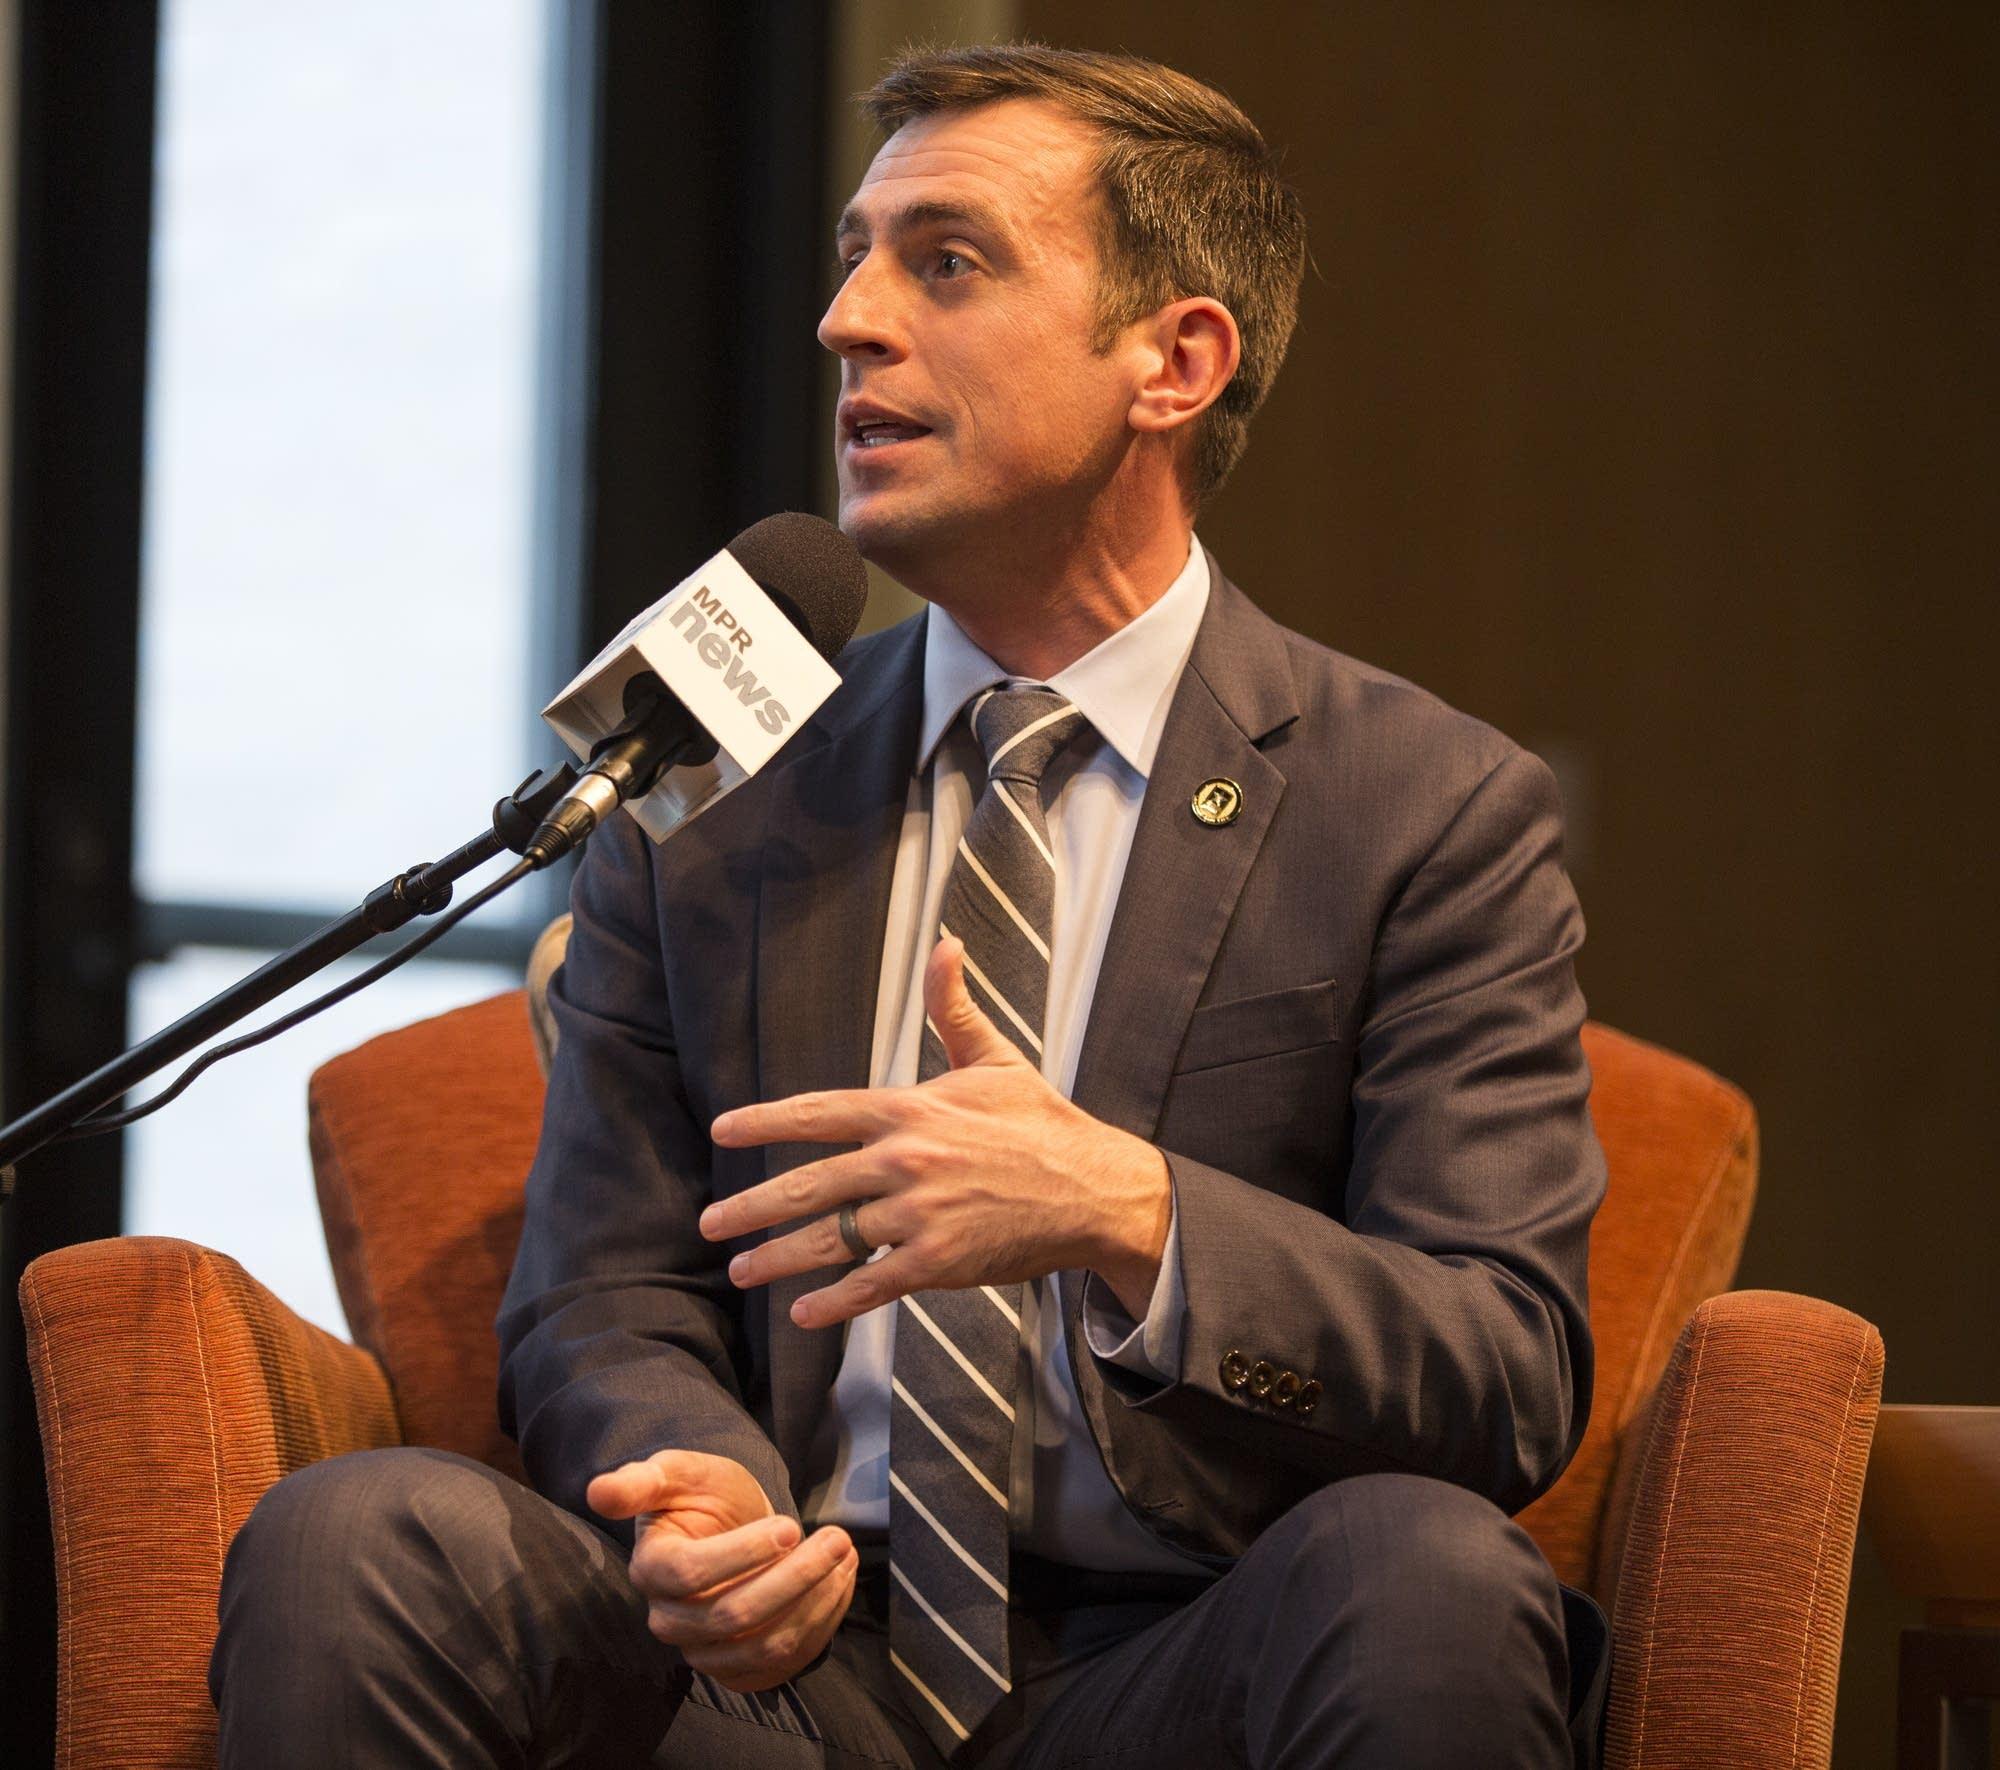 Democrat candidate Dan Feehan speaks at MPR News debate.